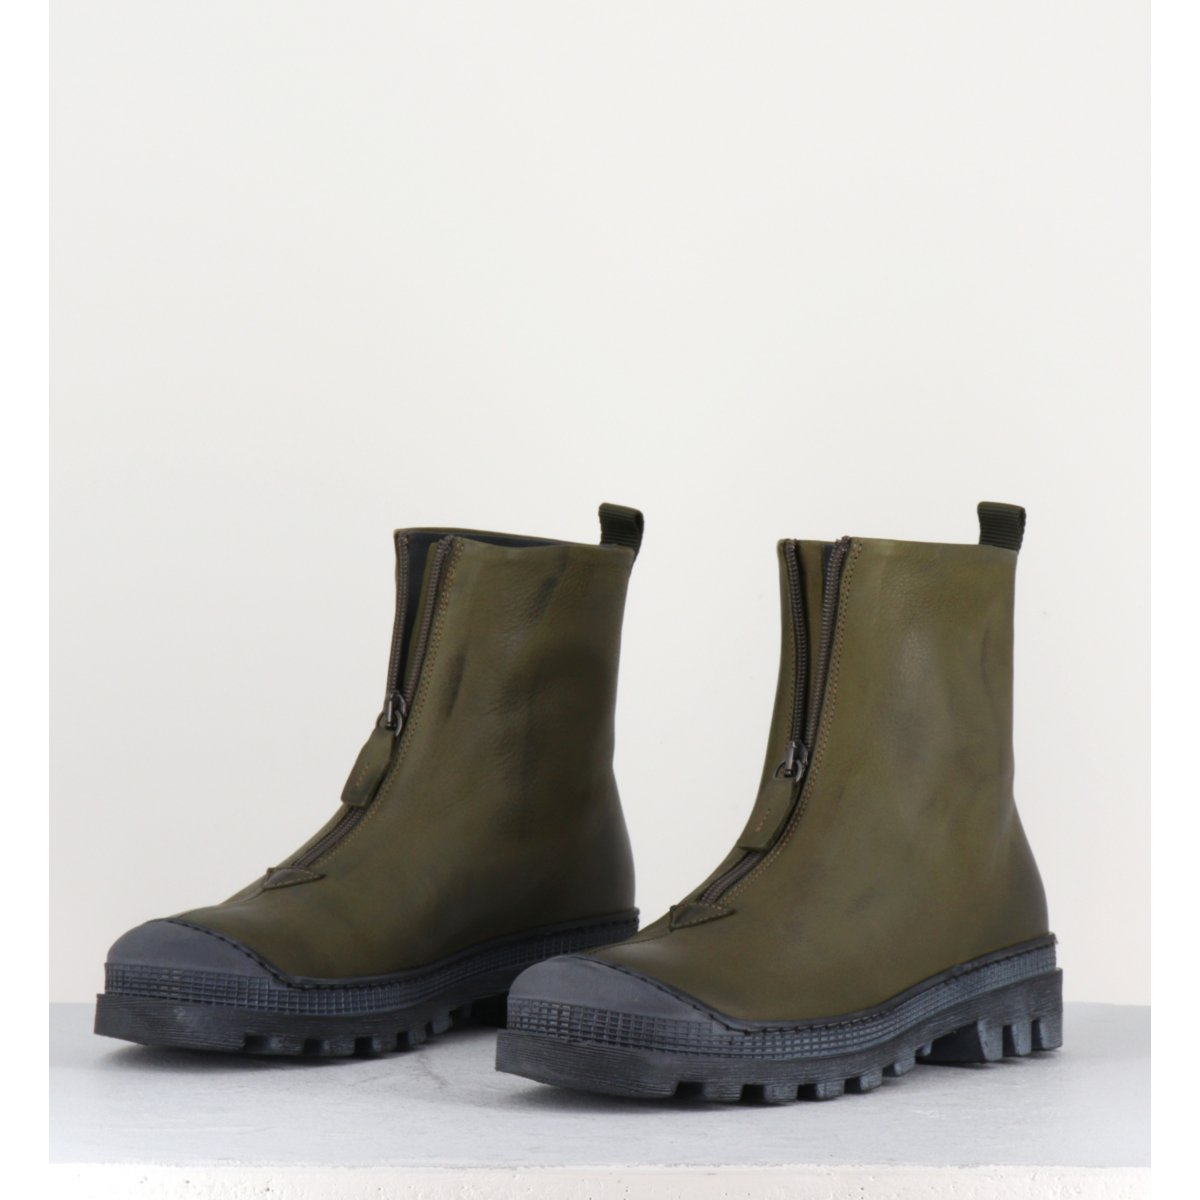 Boots en cuir gras kaki avec zip central - I6-967 KAKI